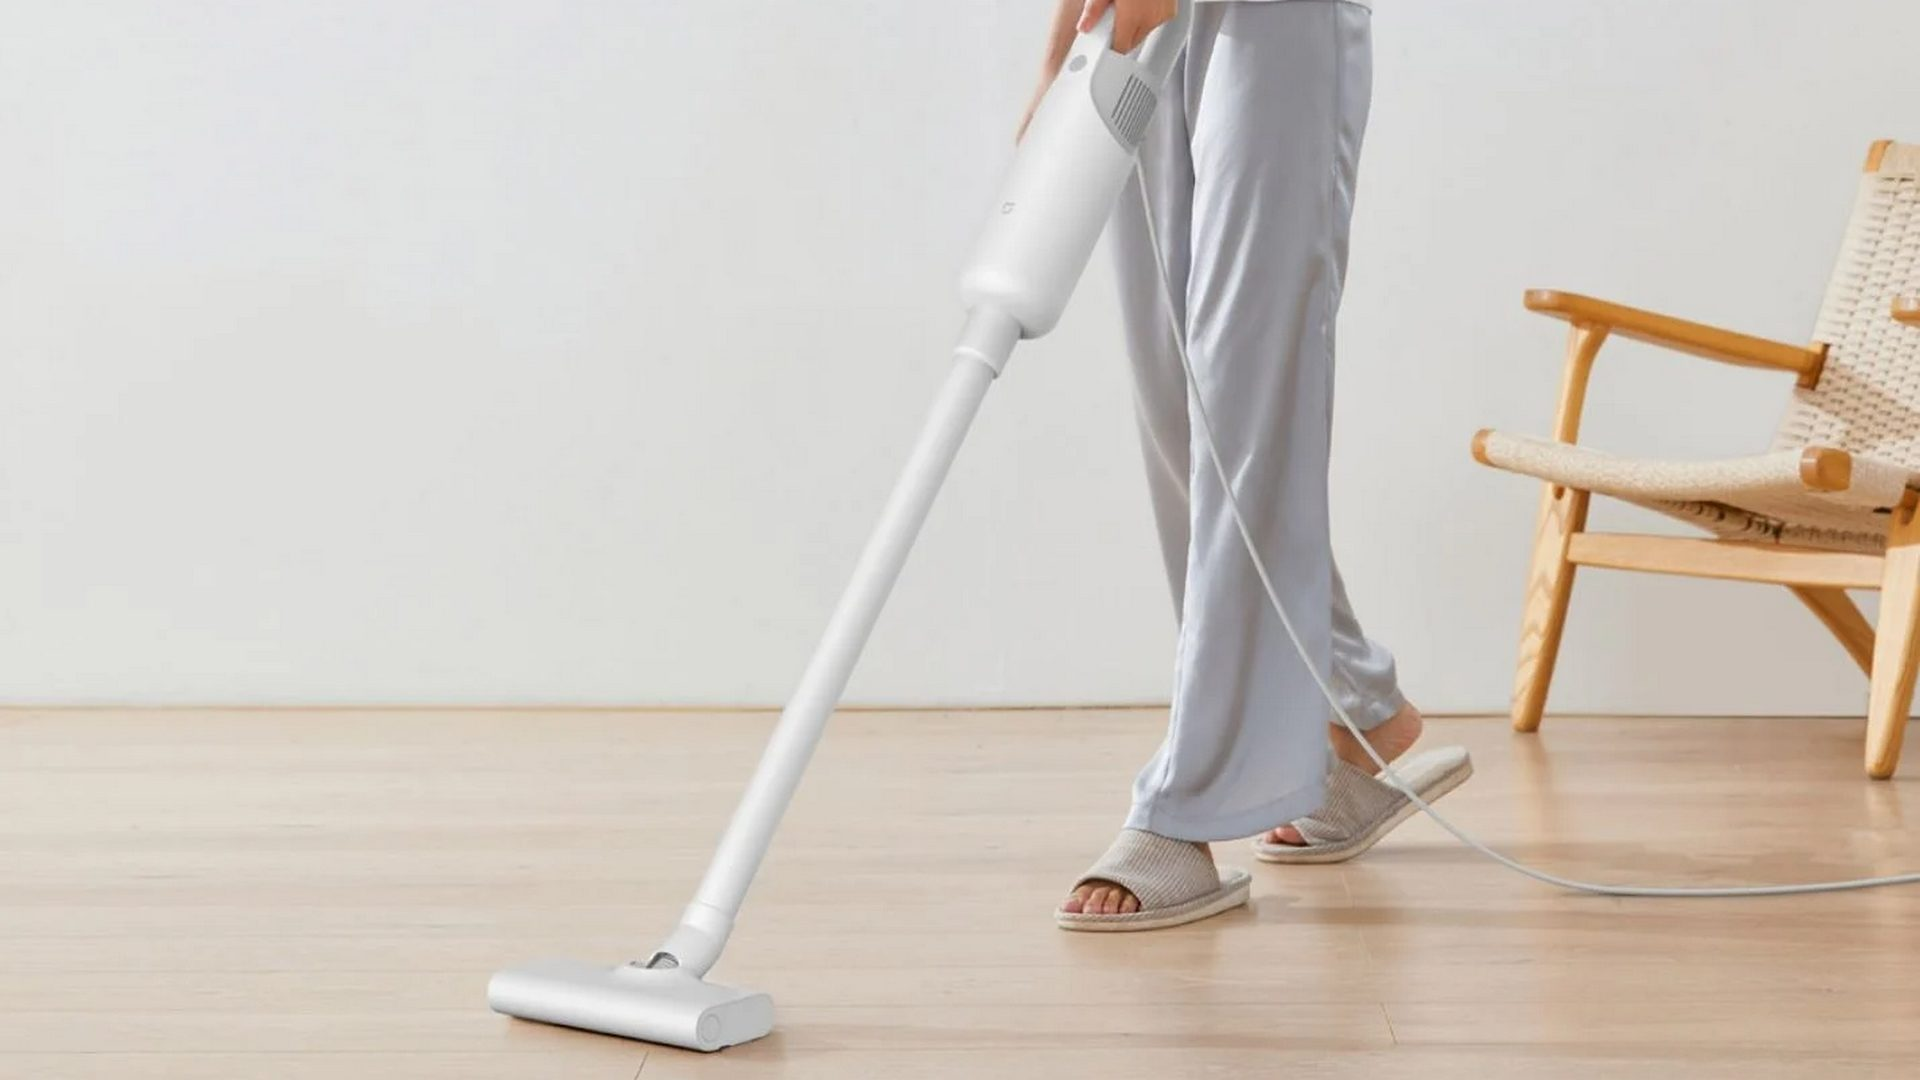 Xiaomi Mijia Vacuum Cleaner MJXCQ01DY | Banggood